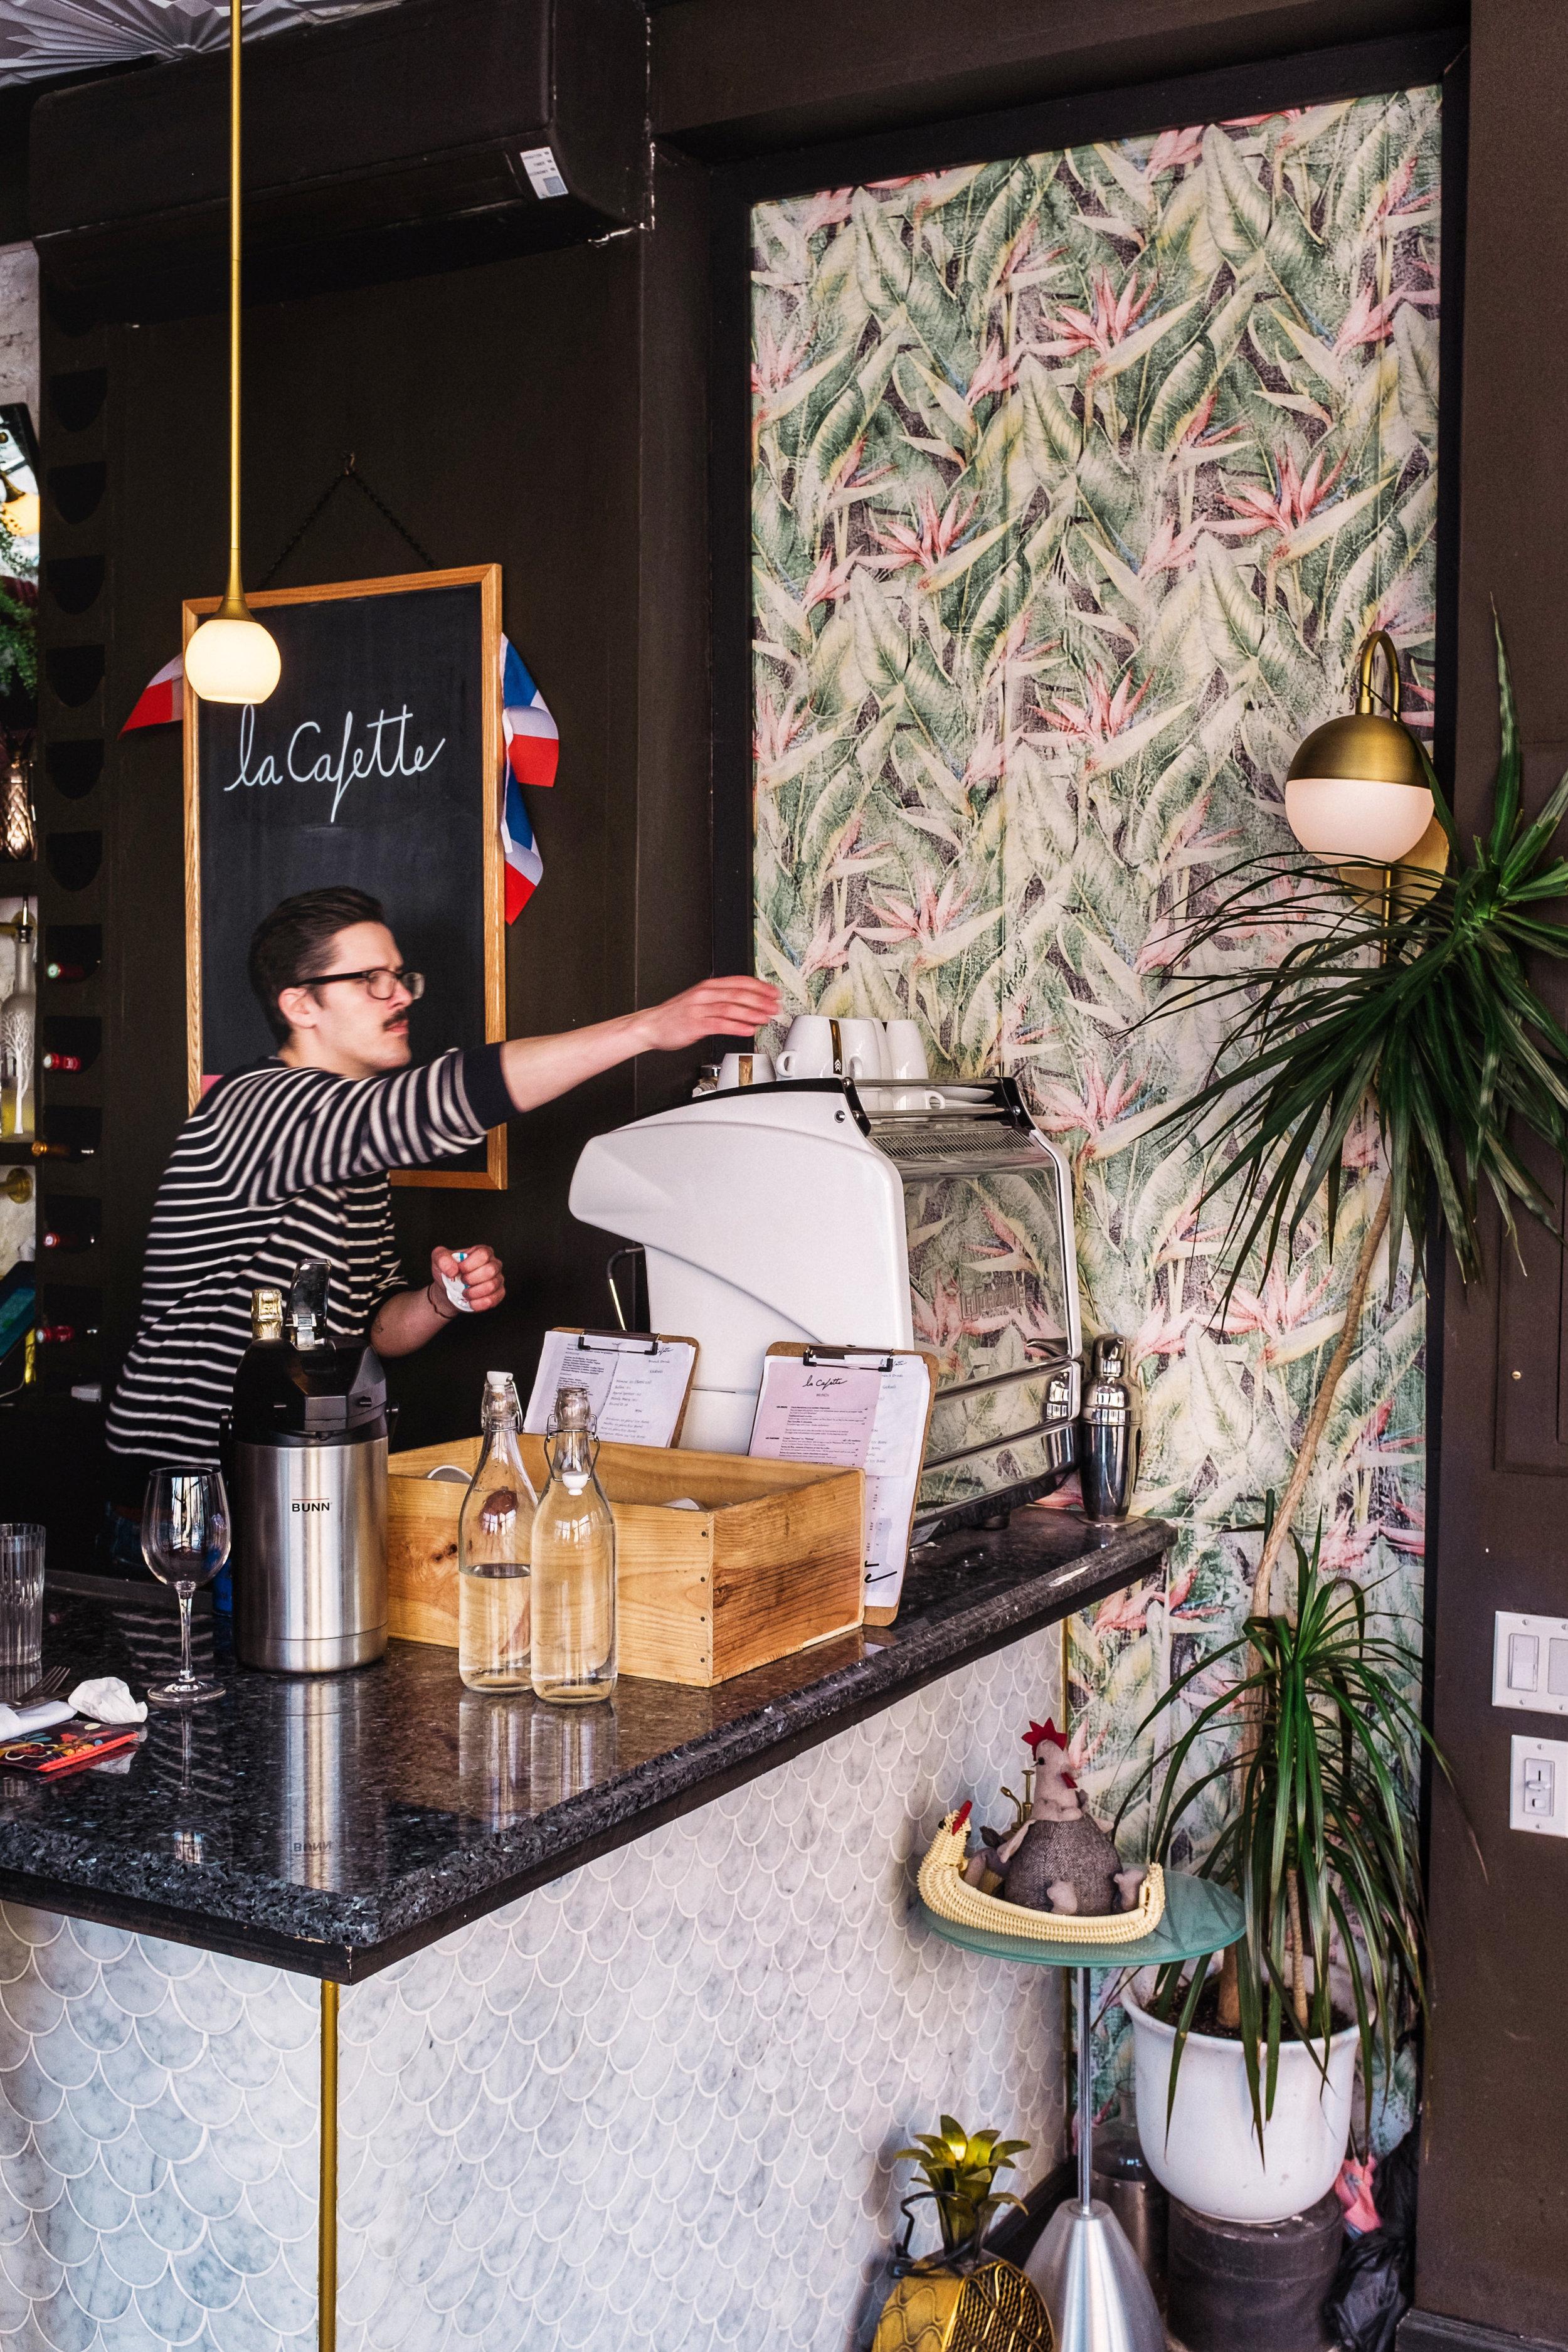 la cafette coffee